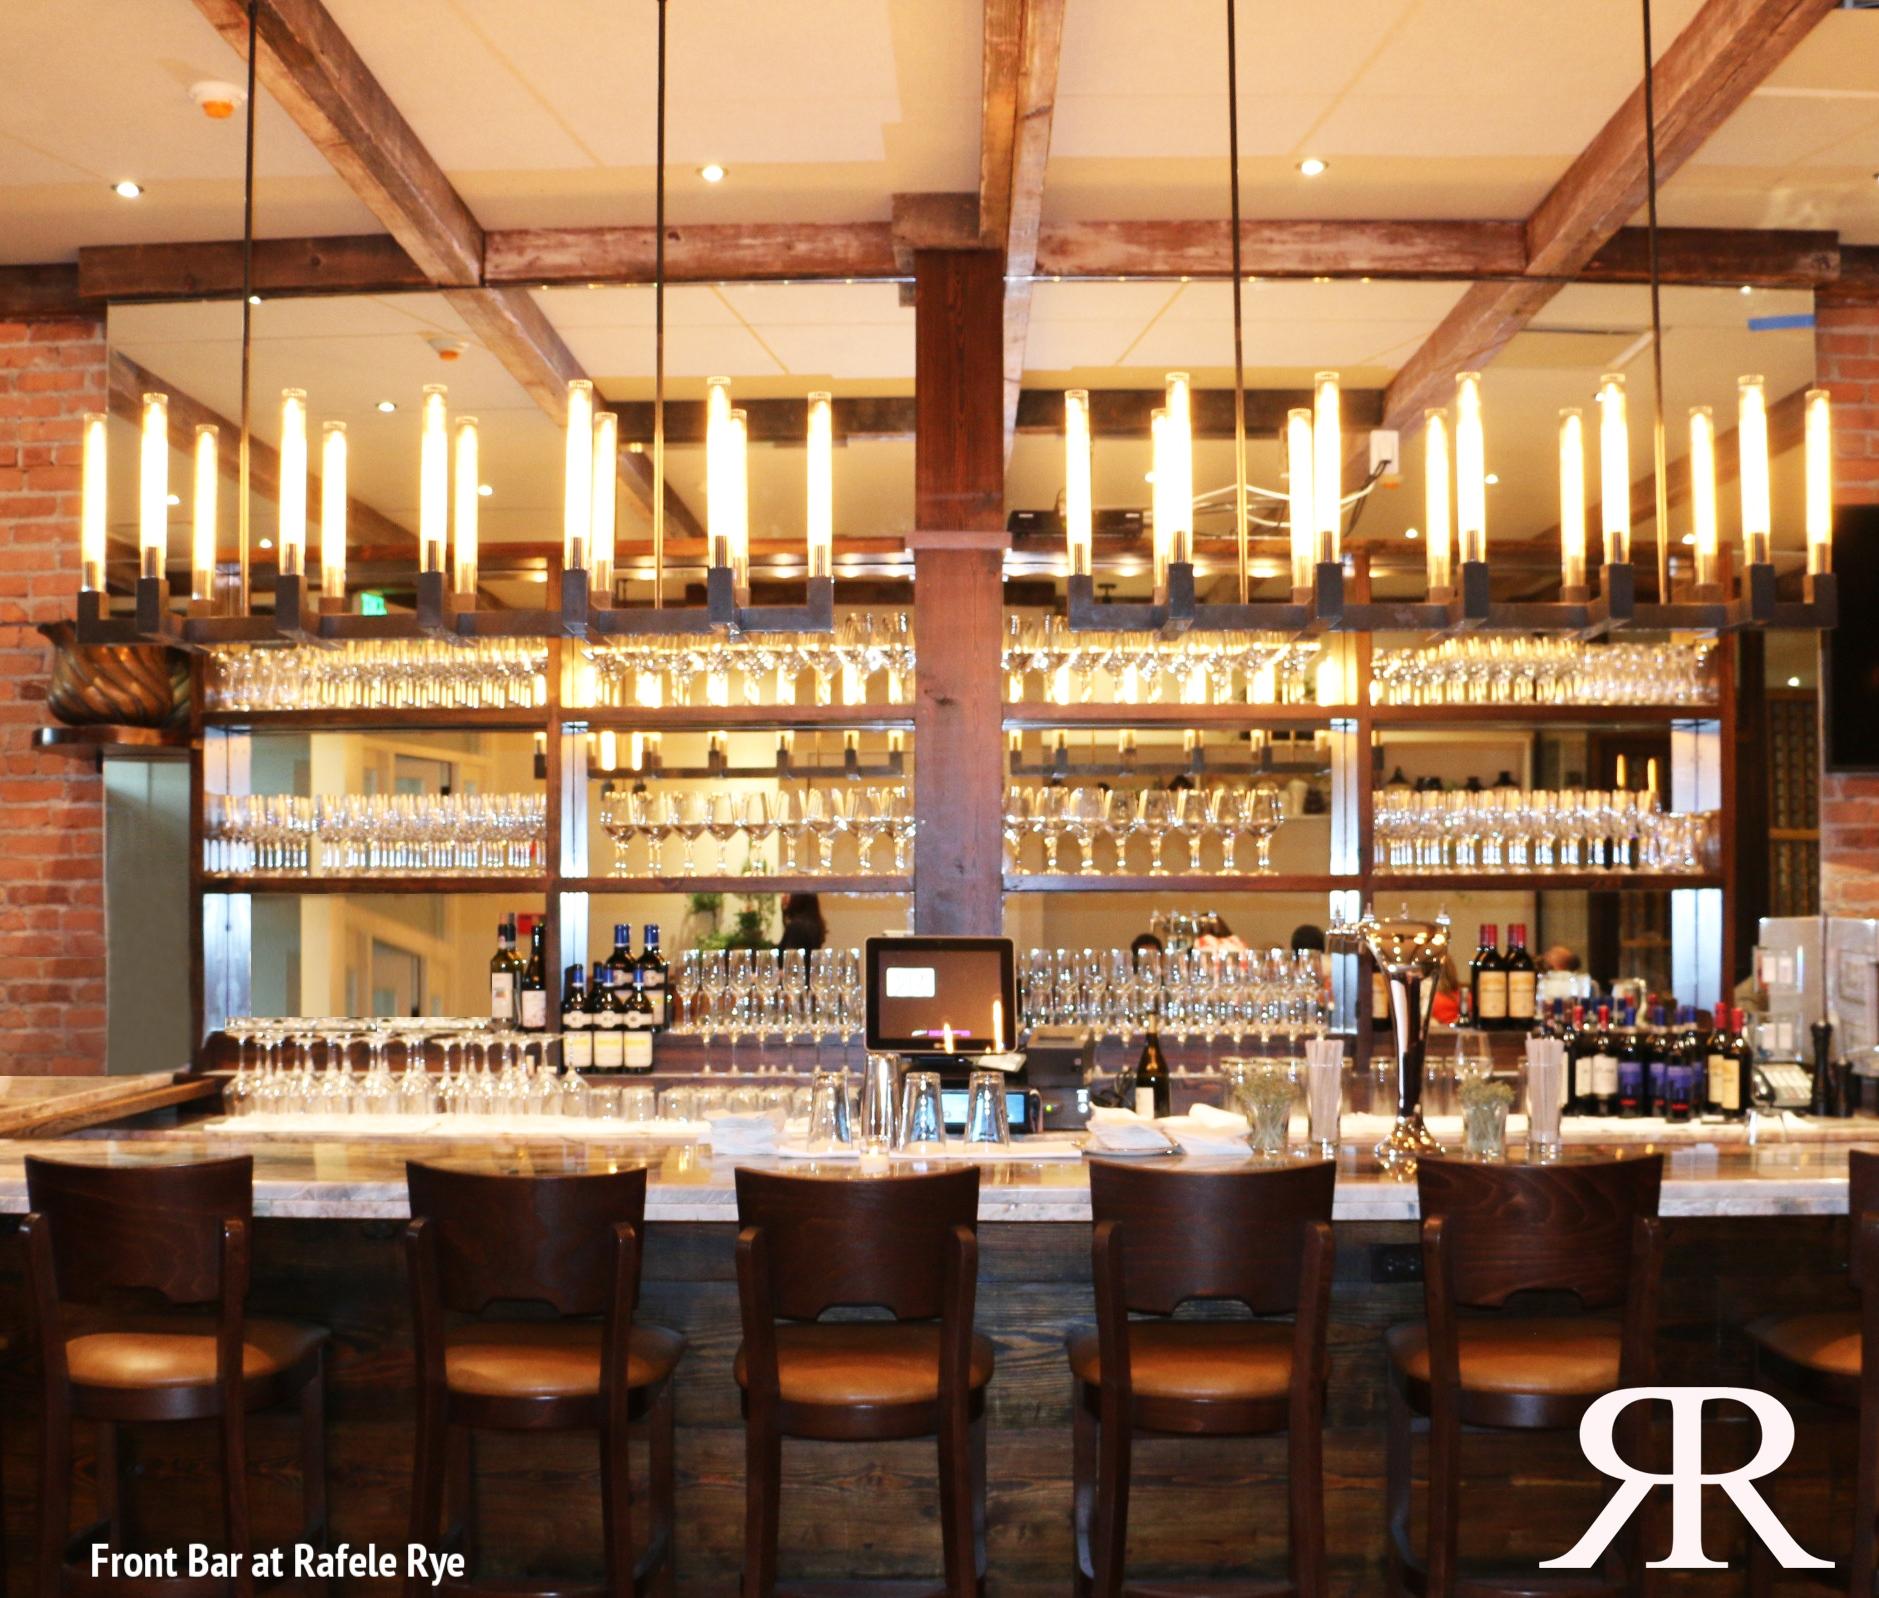 Rafele Rye Front Bar